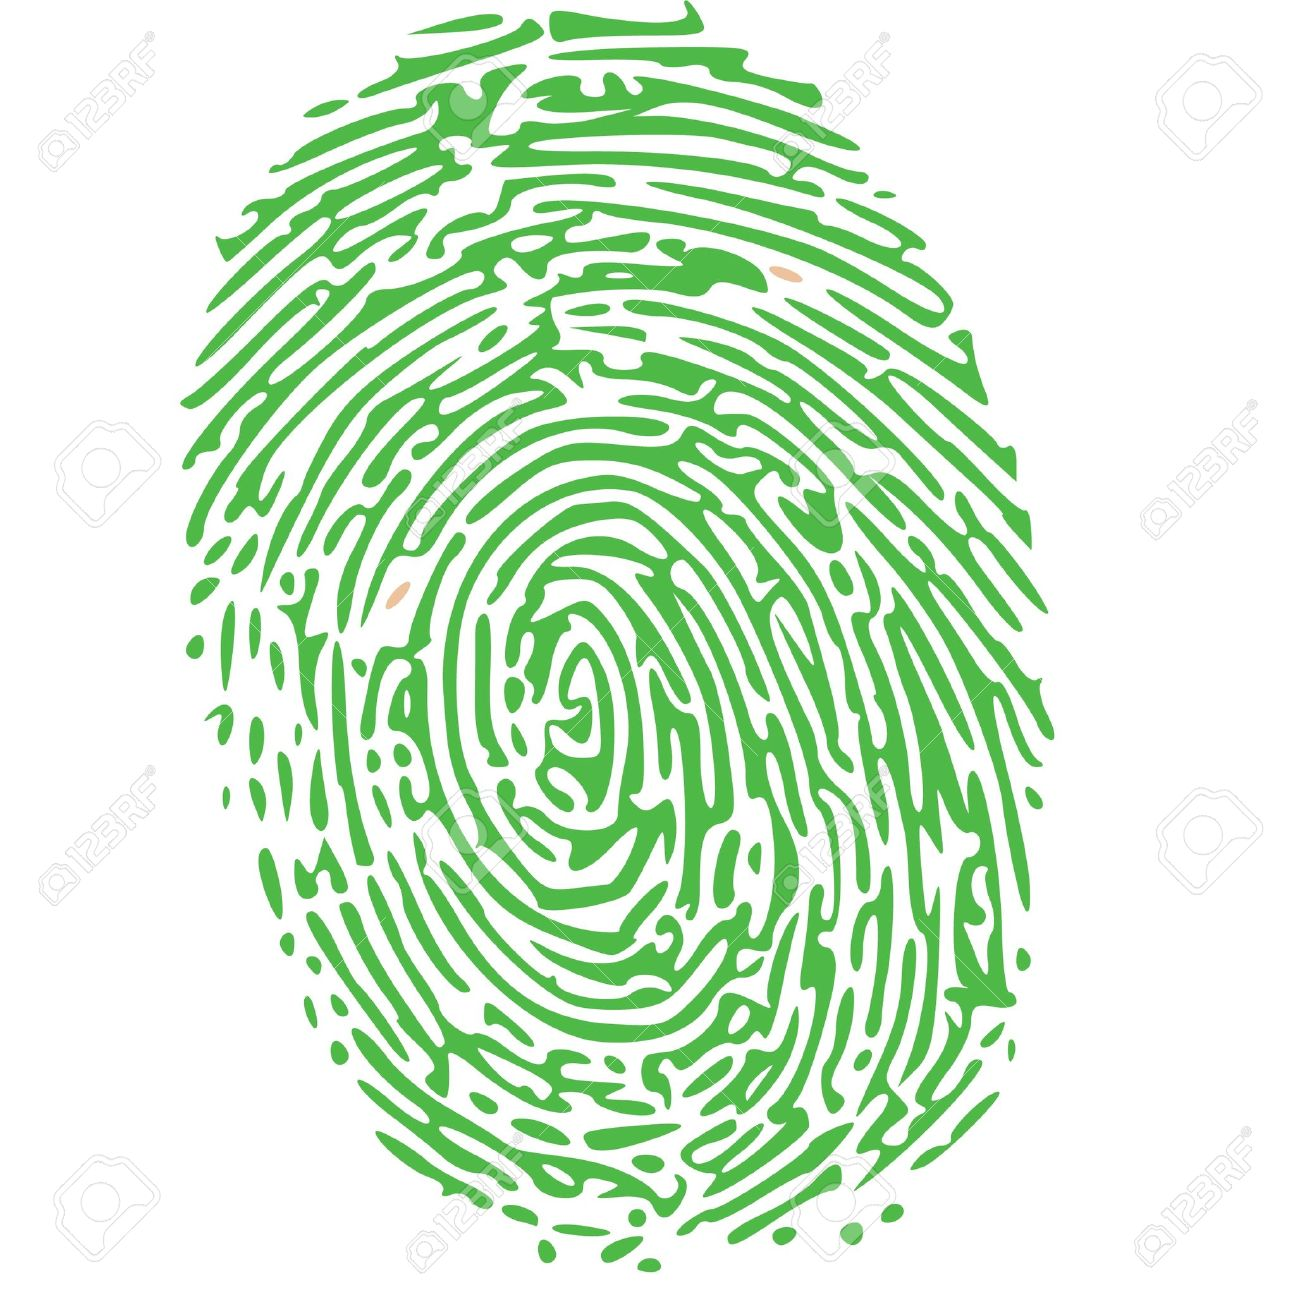 Free Fingerprint Clipart, Download Free Clip Art, Free Clip Art on Clipart  Library